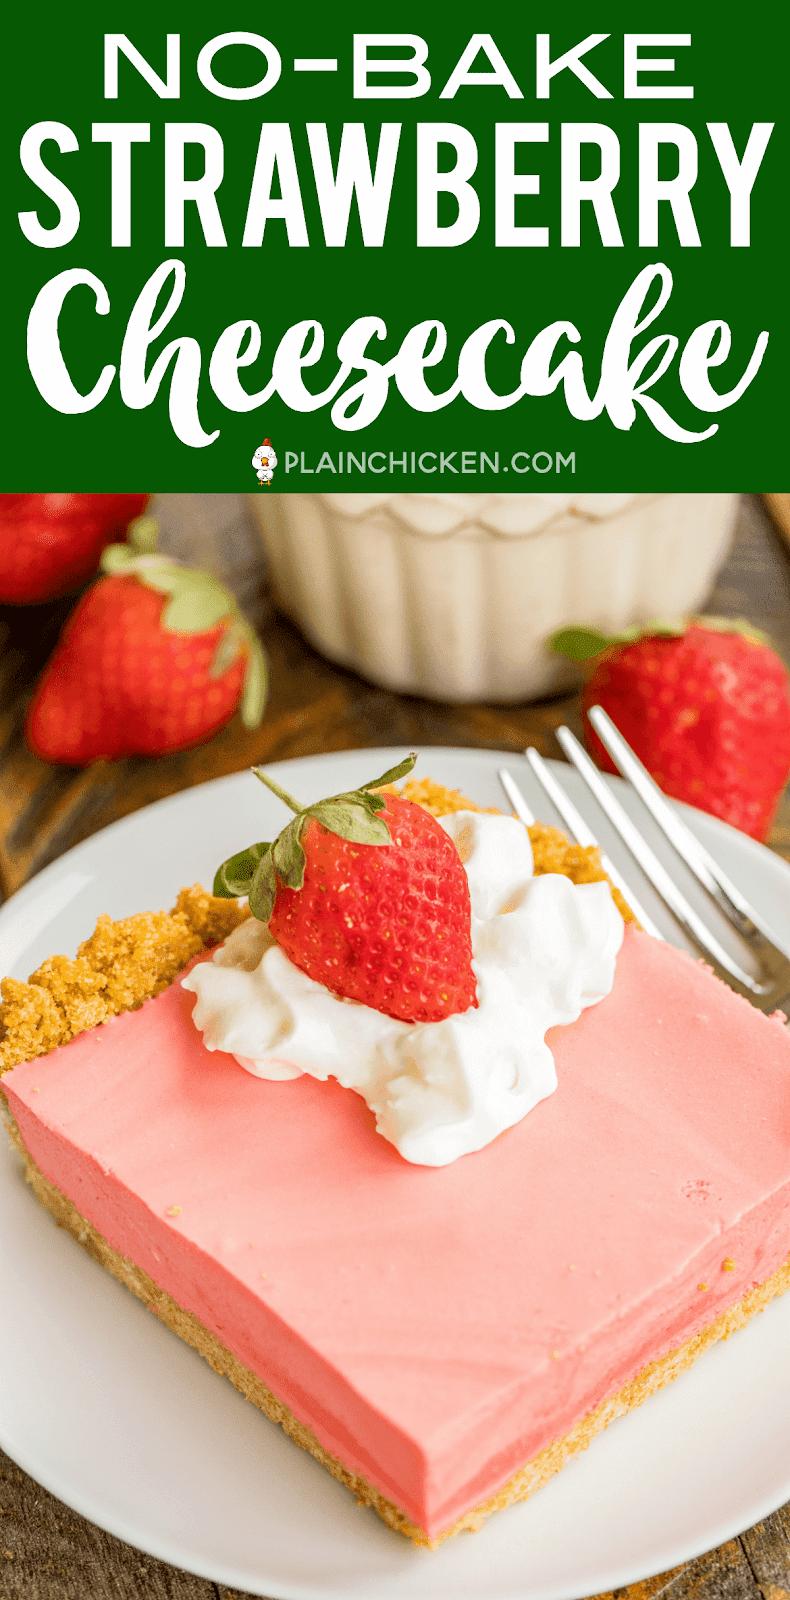 No Bake Strawberry Cheesecake Recipe Graham Cracker Crust Light And Fluffy No Bake C Baked Strawberries Evaporated Milk Recipes Strawberry Cheesecake Recipe